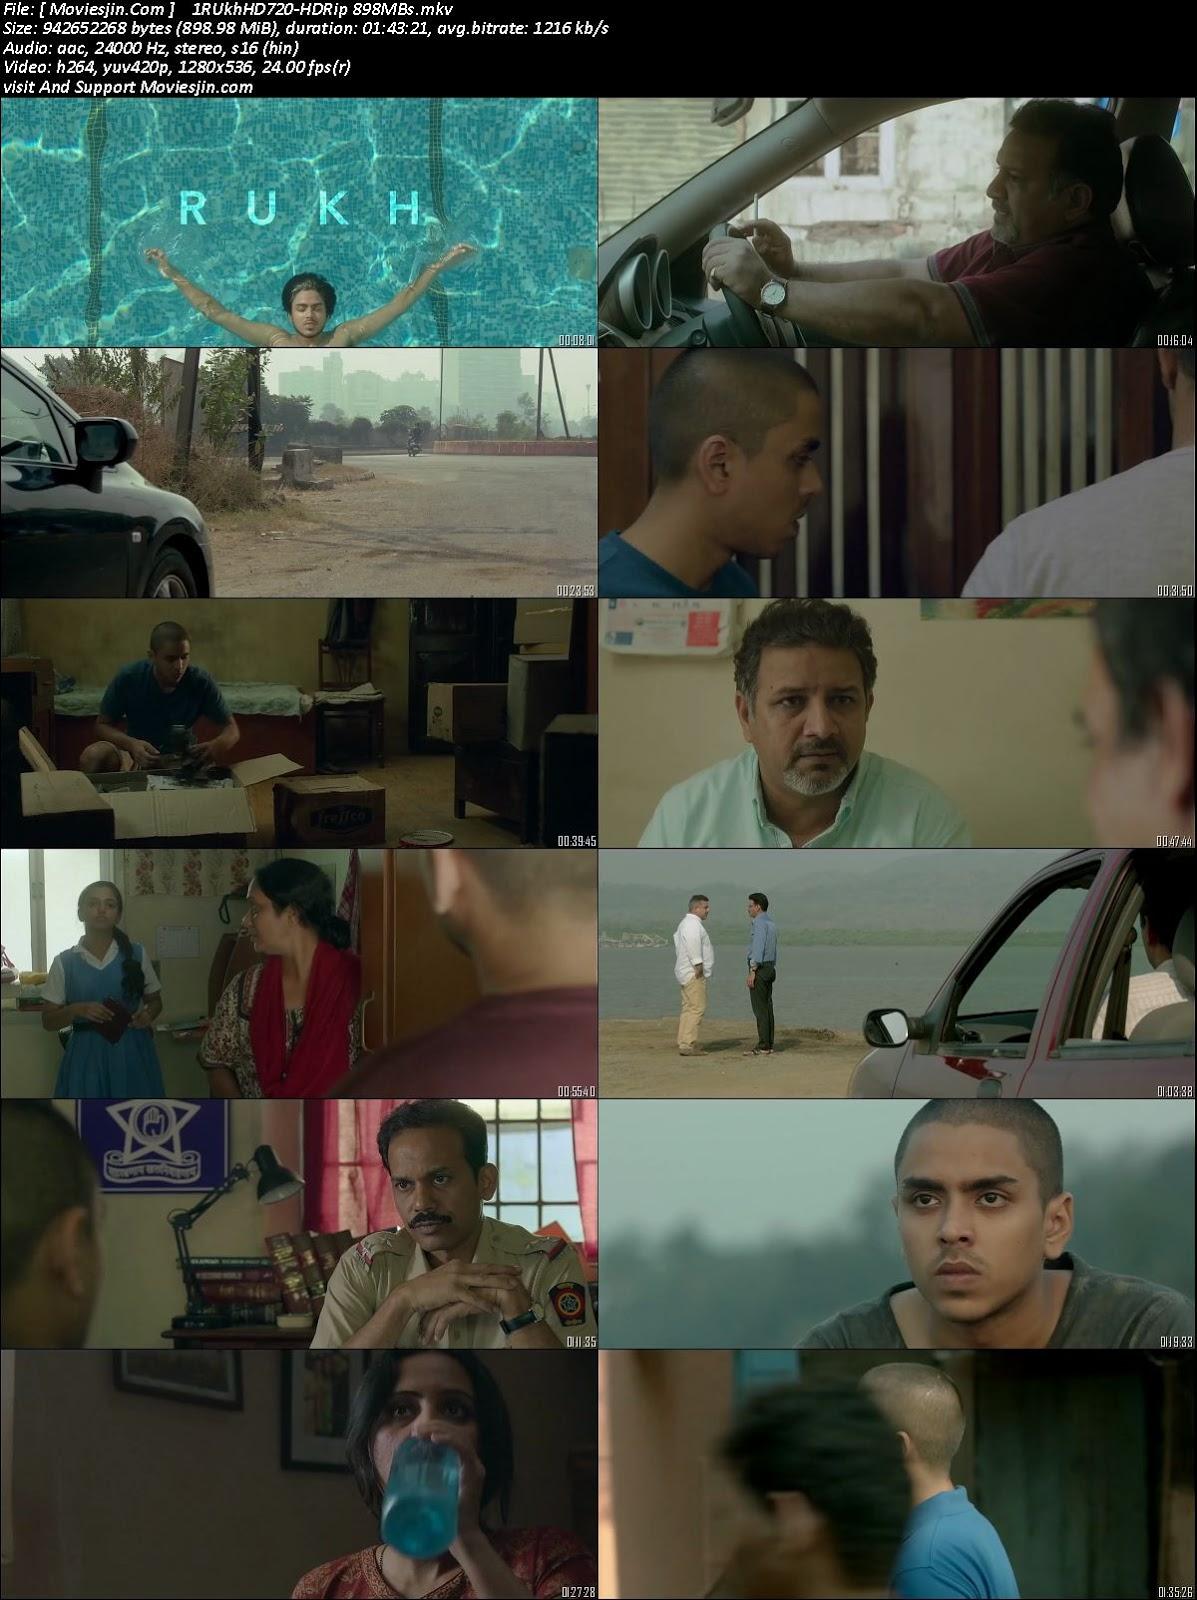 Watch Online Rukh 2017 HDRip 900MB Full Hindi Movie 720p ESub Full Movie Download Khatrimaza, free download 9xmovies,